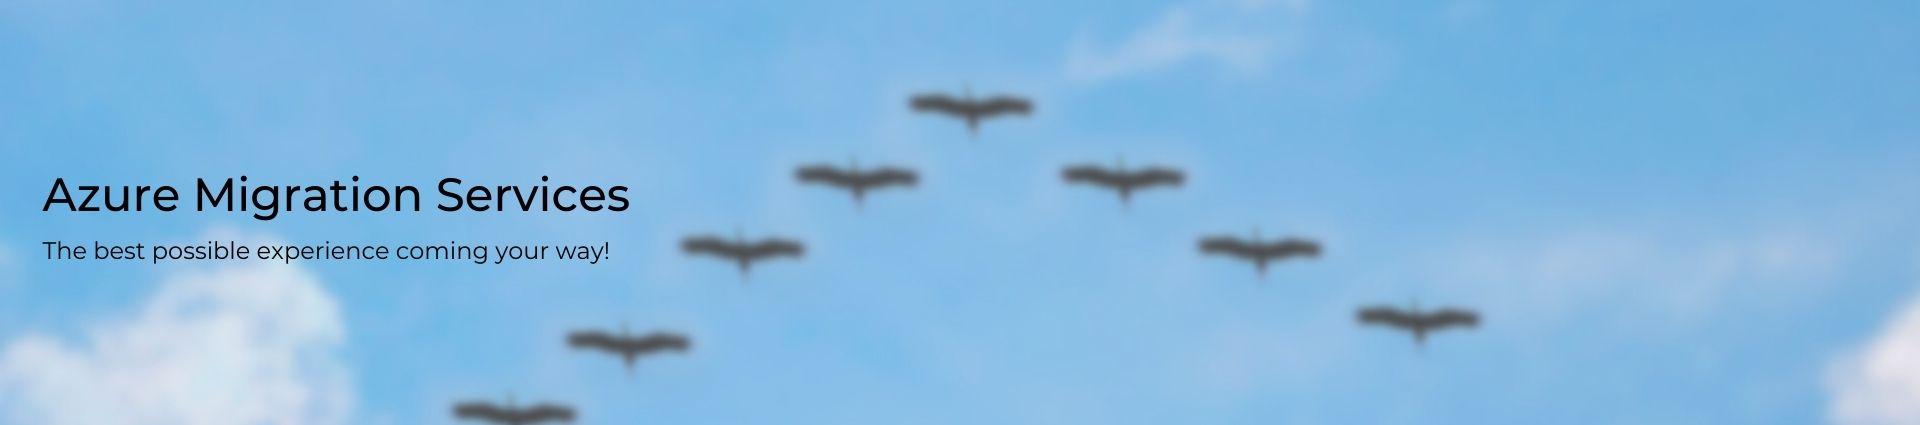 Xekera Azure Migration Services